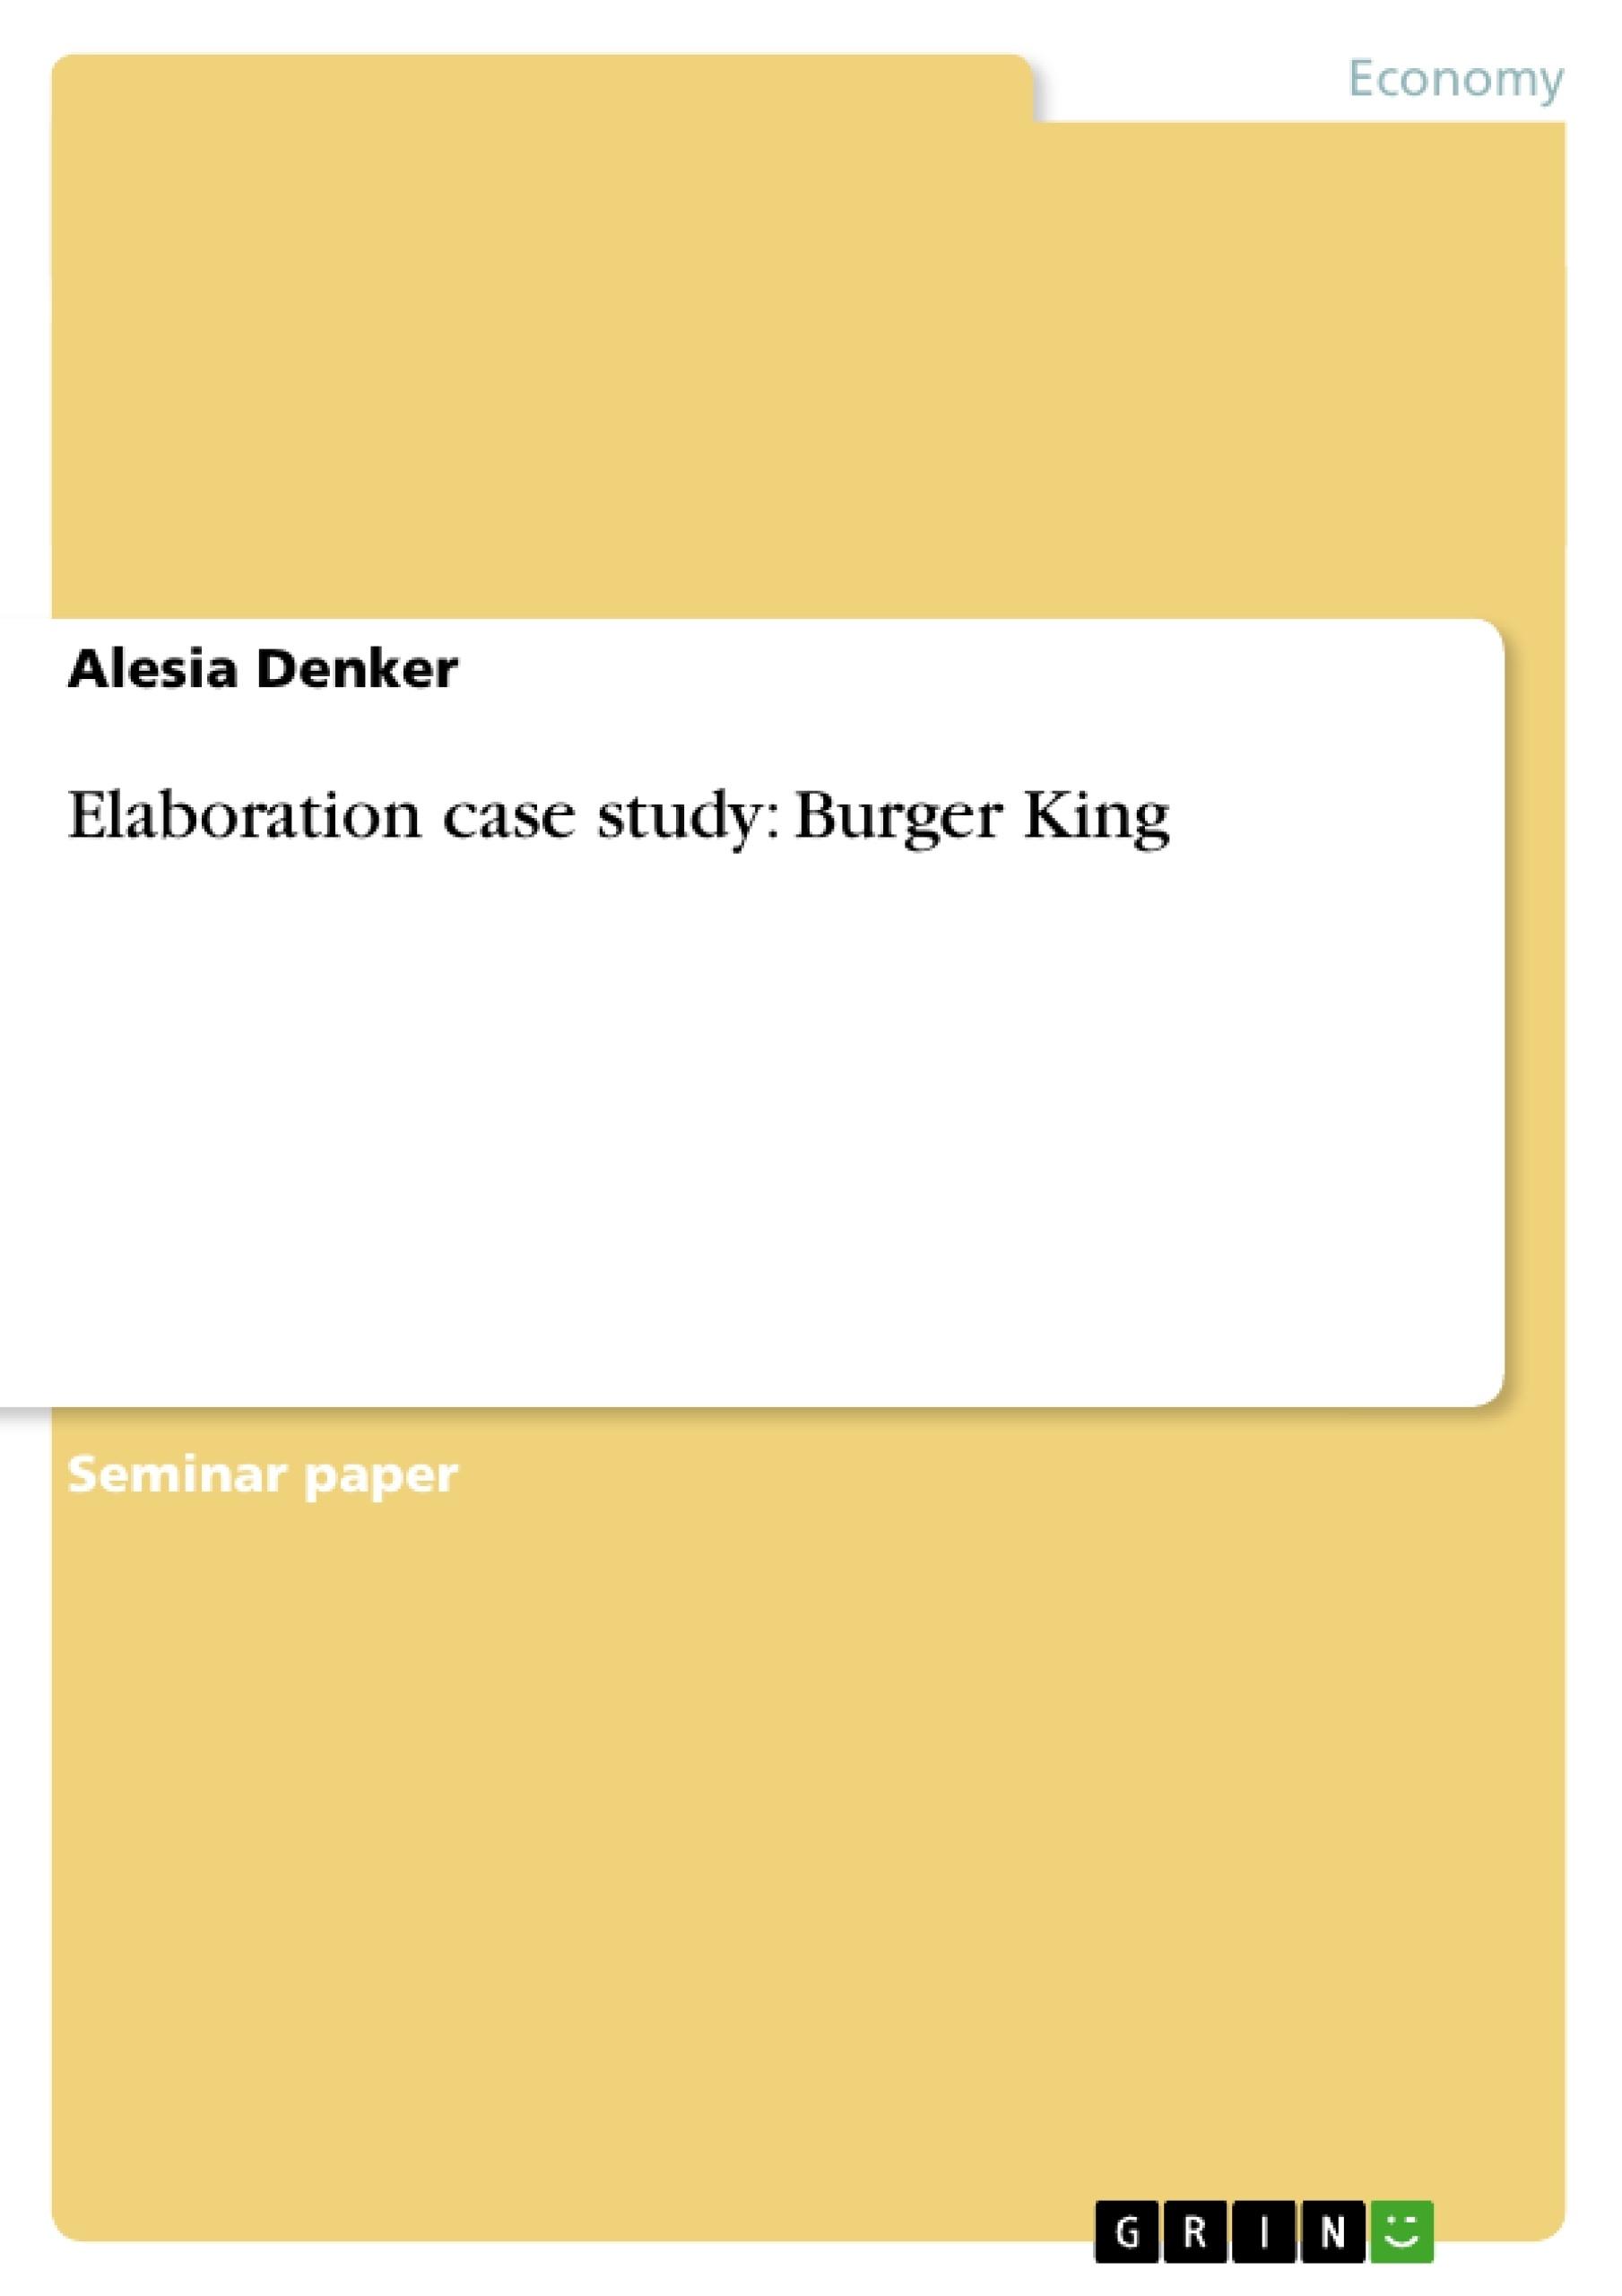 Title: Elaboration case study: Burger King